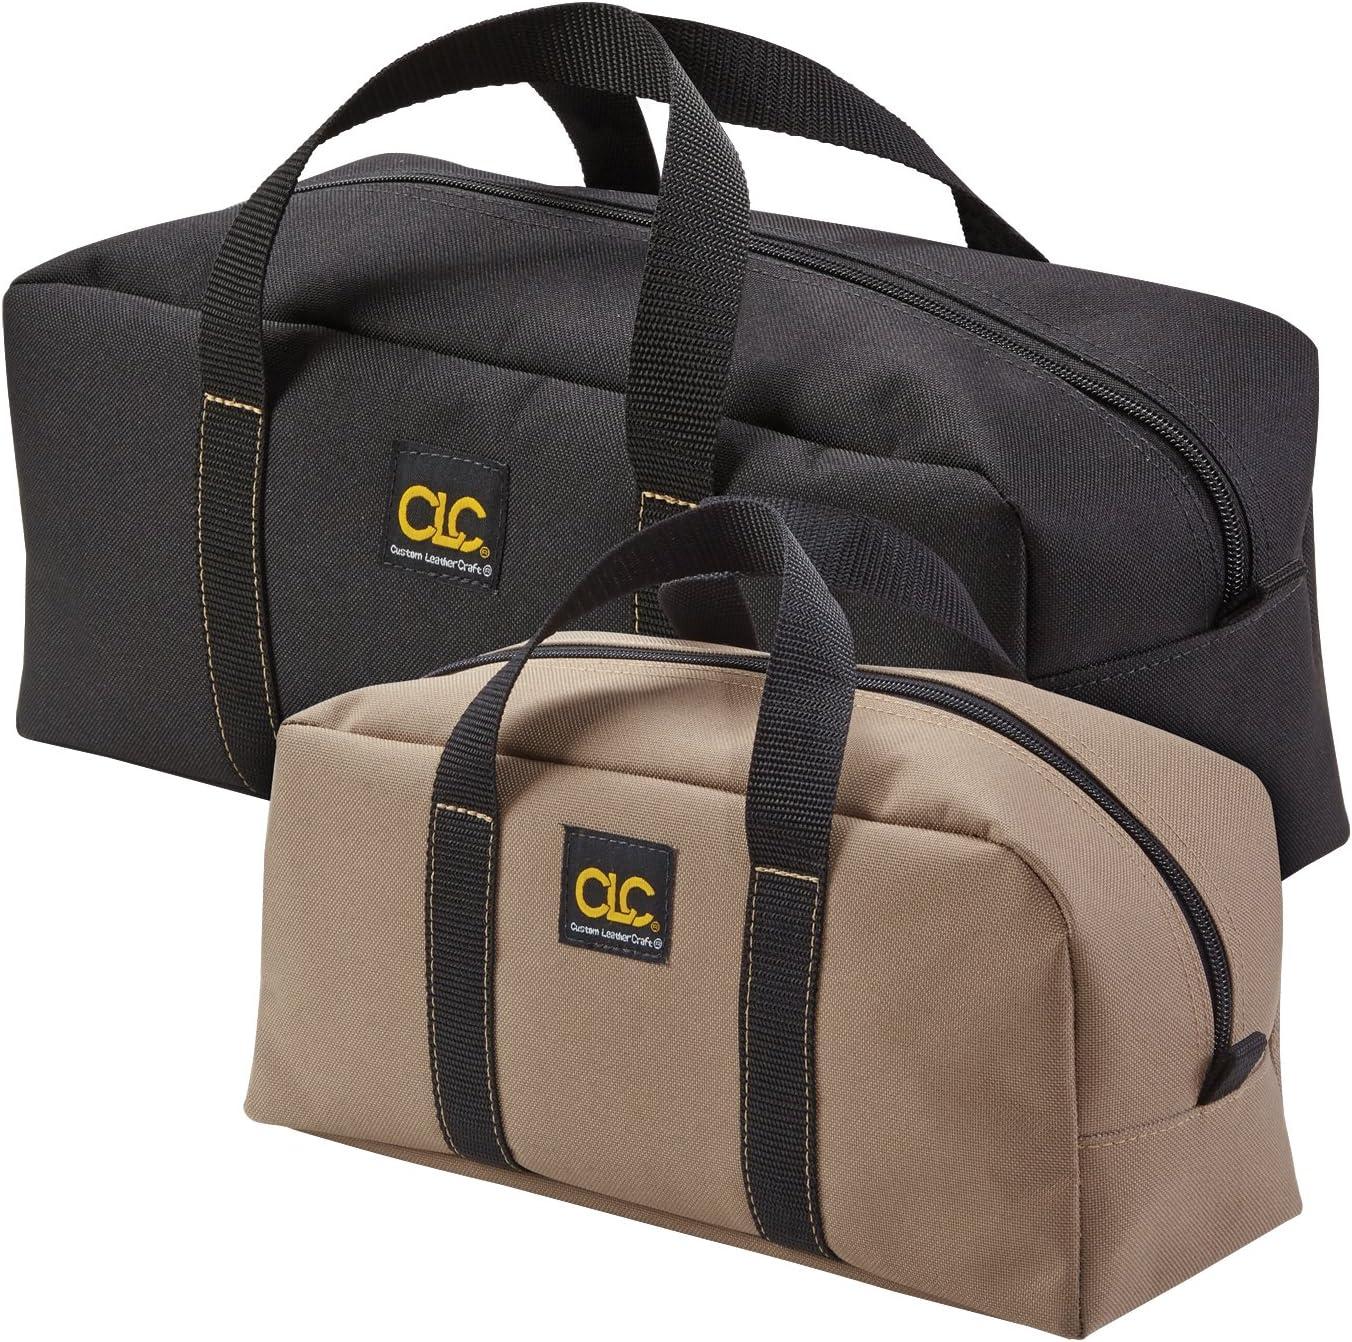 CLC Custom Leathercraft 1107 2 Pack Medium and Large Utility Tote Bag Combo, Black/Beige - Tool Bags -